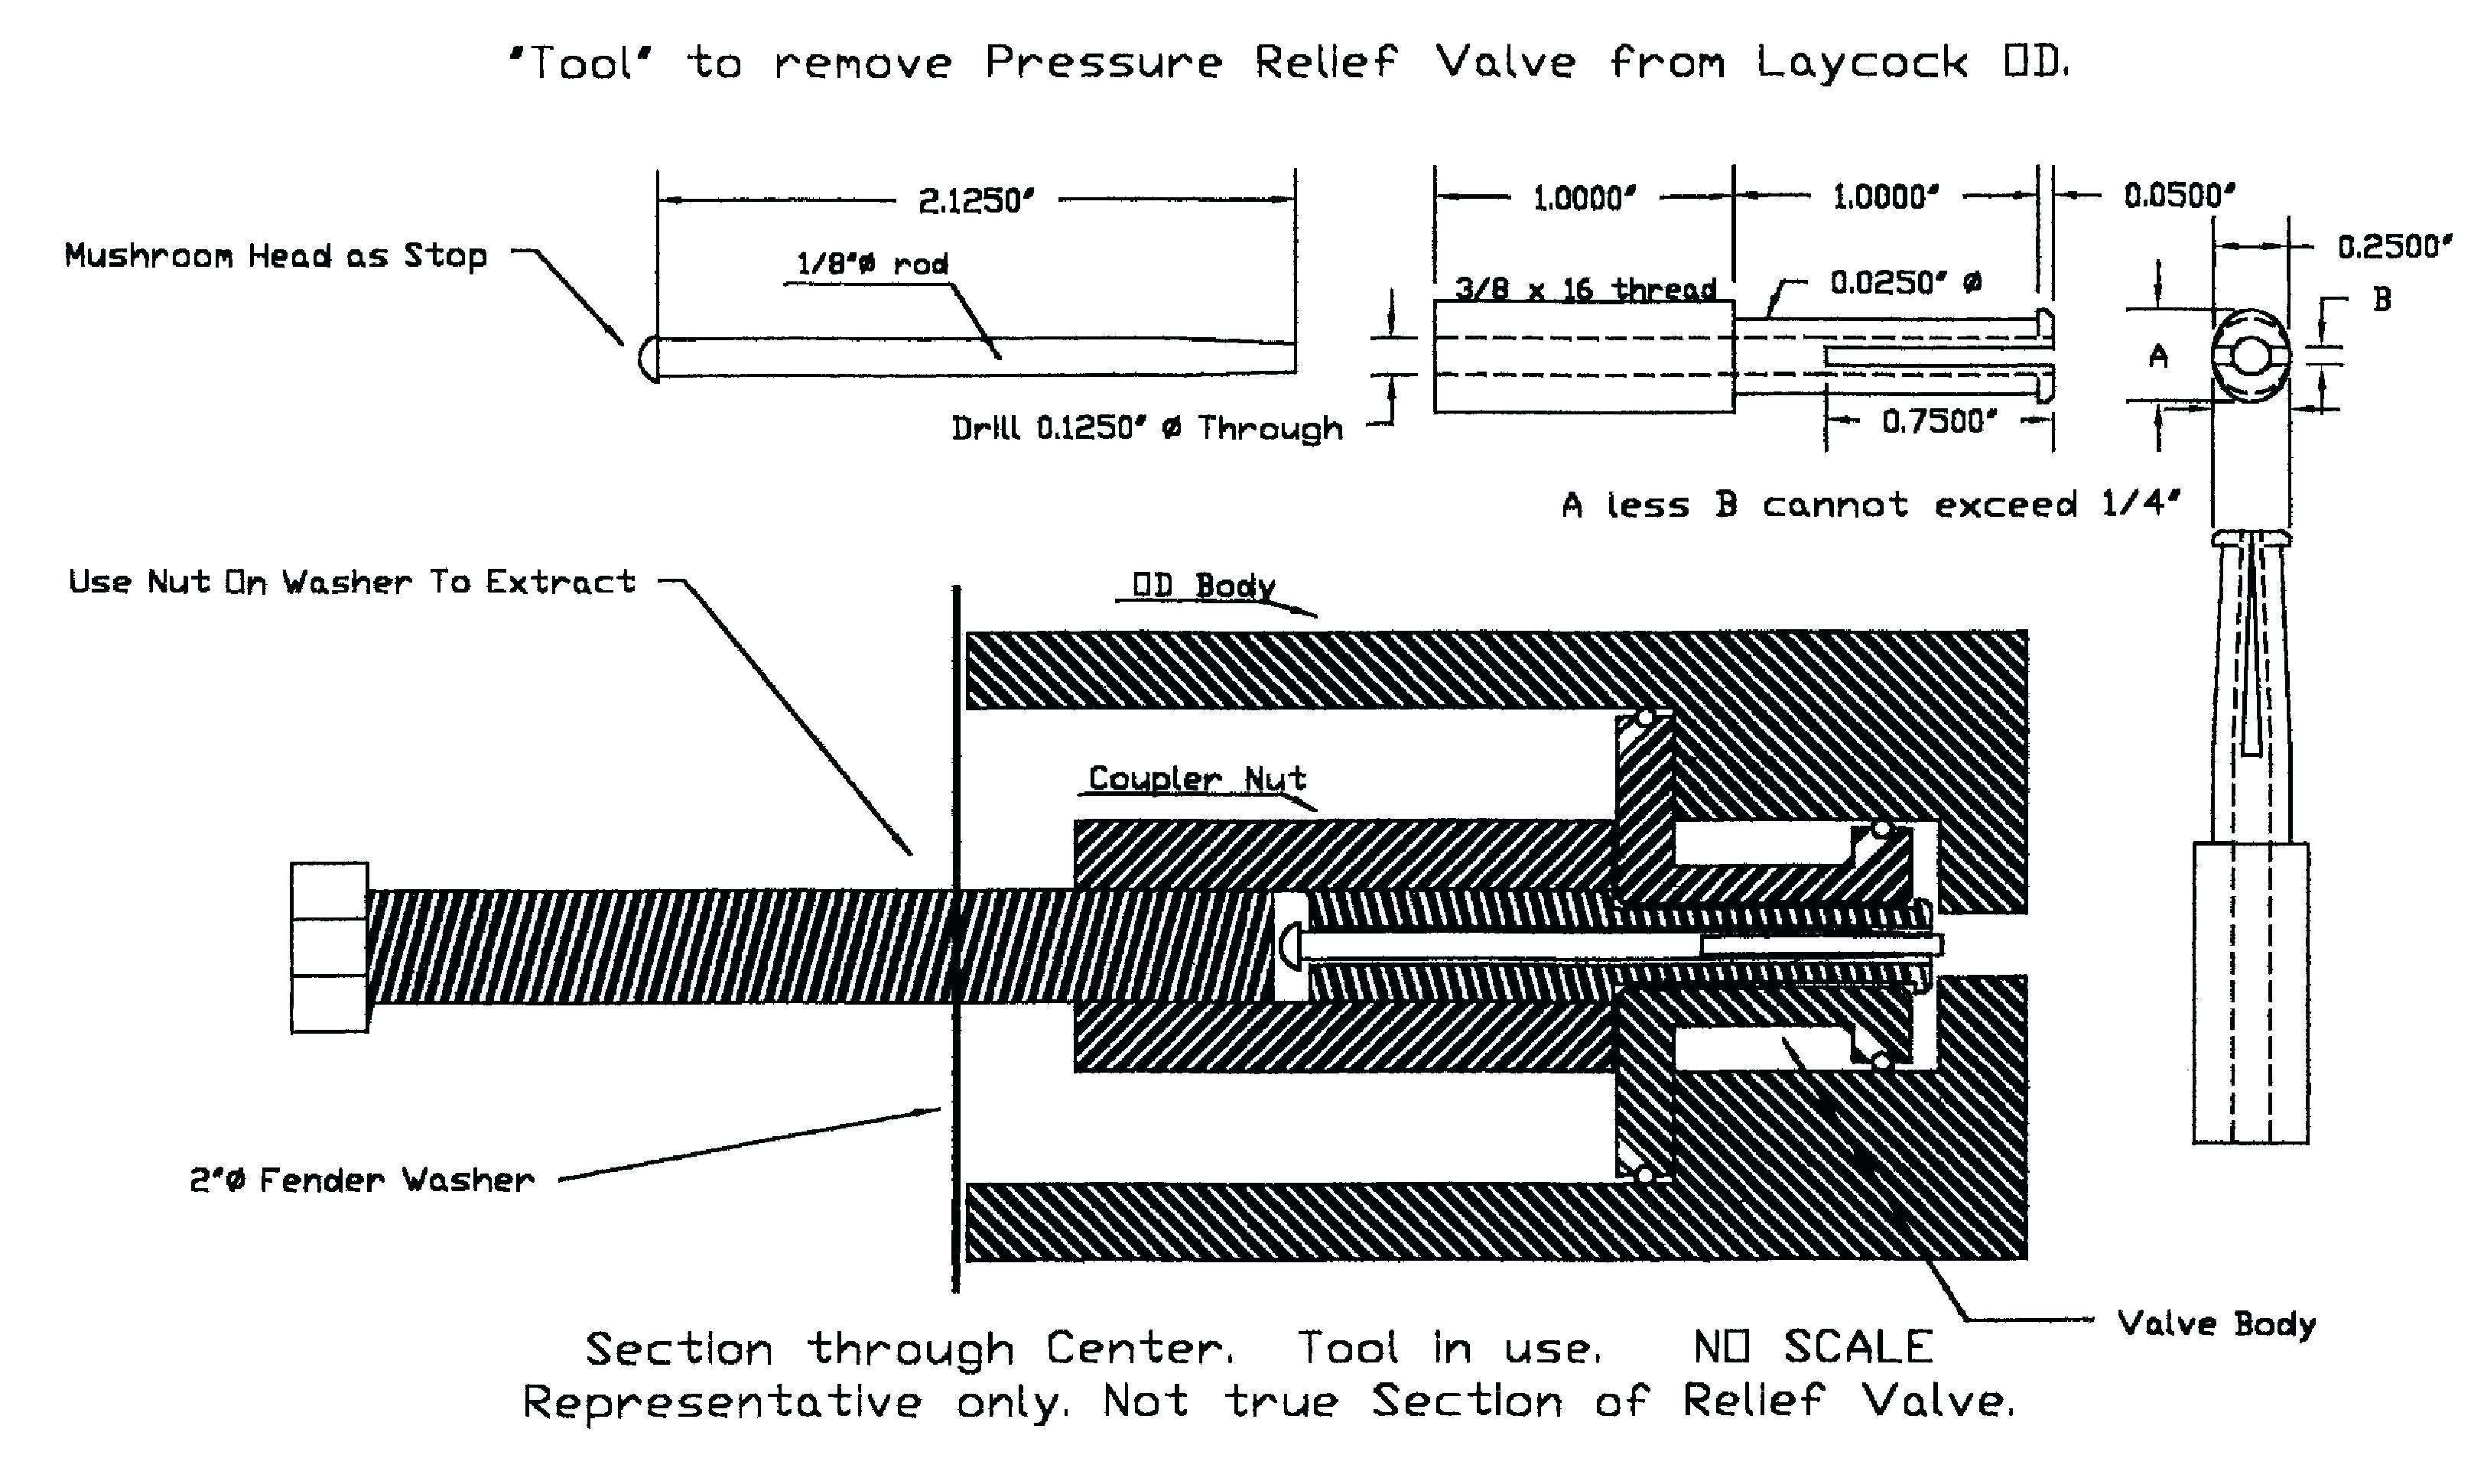 Engine Cooling Diagram Wiring Diagram for Doorbell Transformer W Engine Audi 2 8 12 Valve 3 Of Engine Cooling Diagram